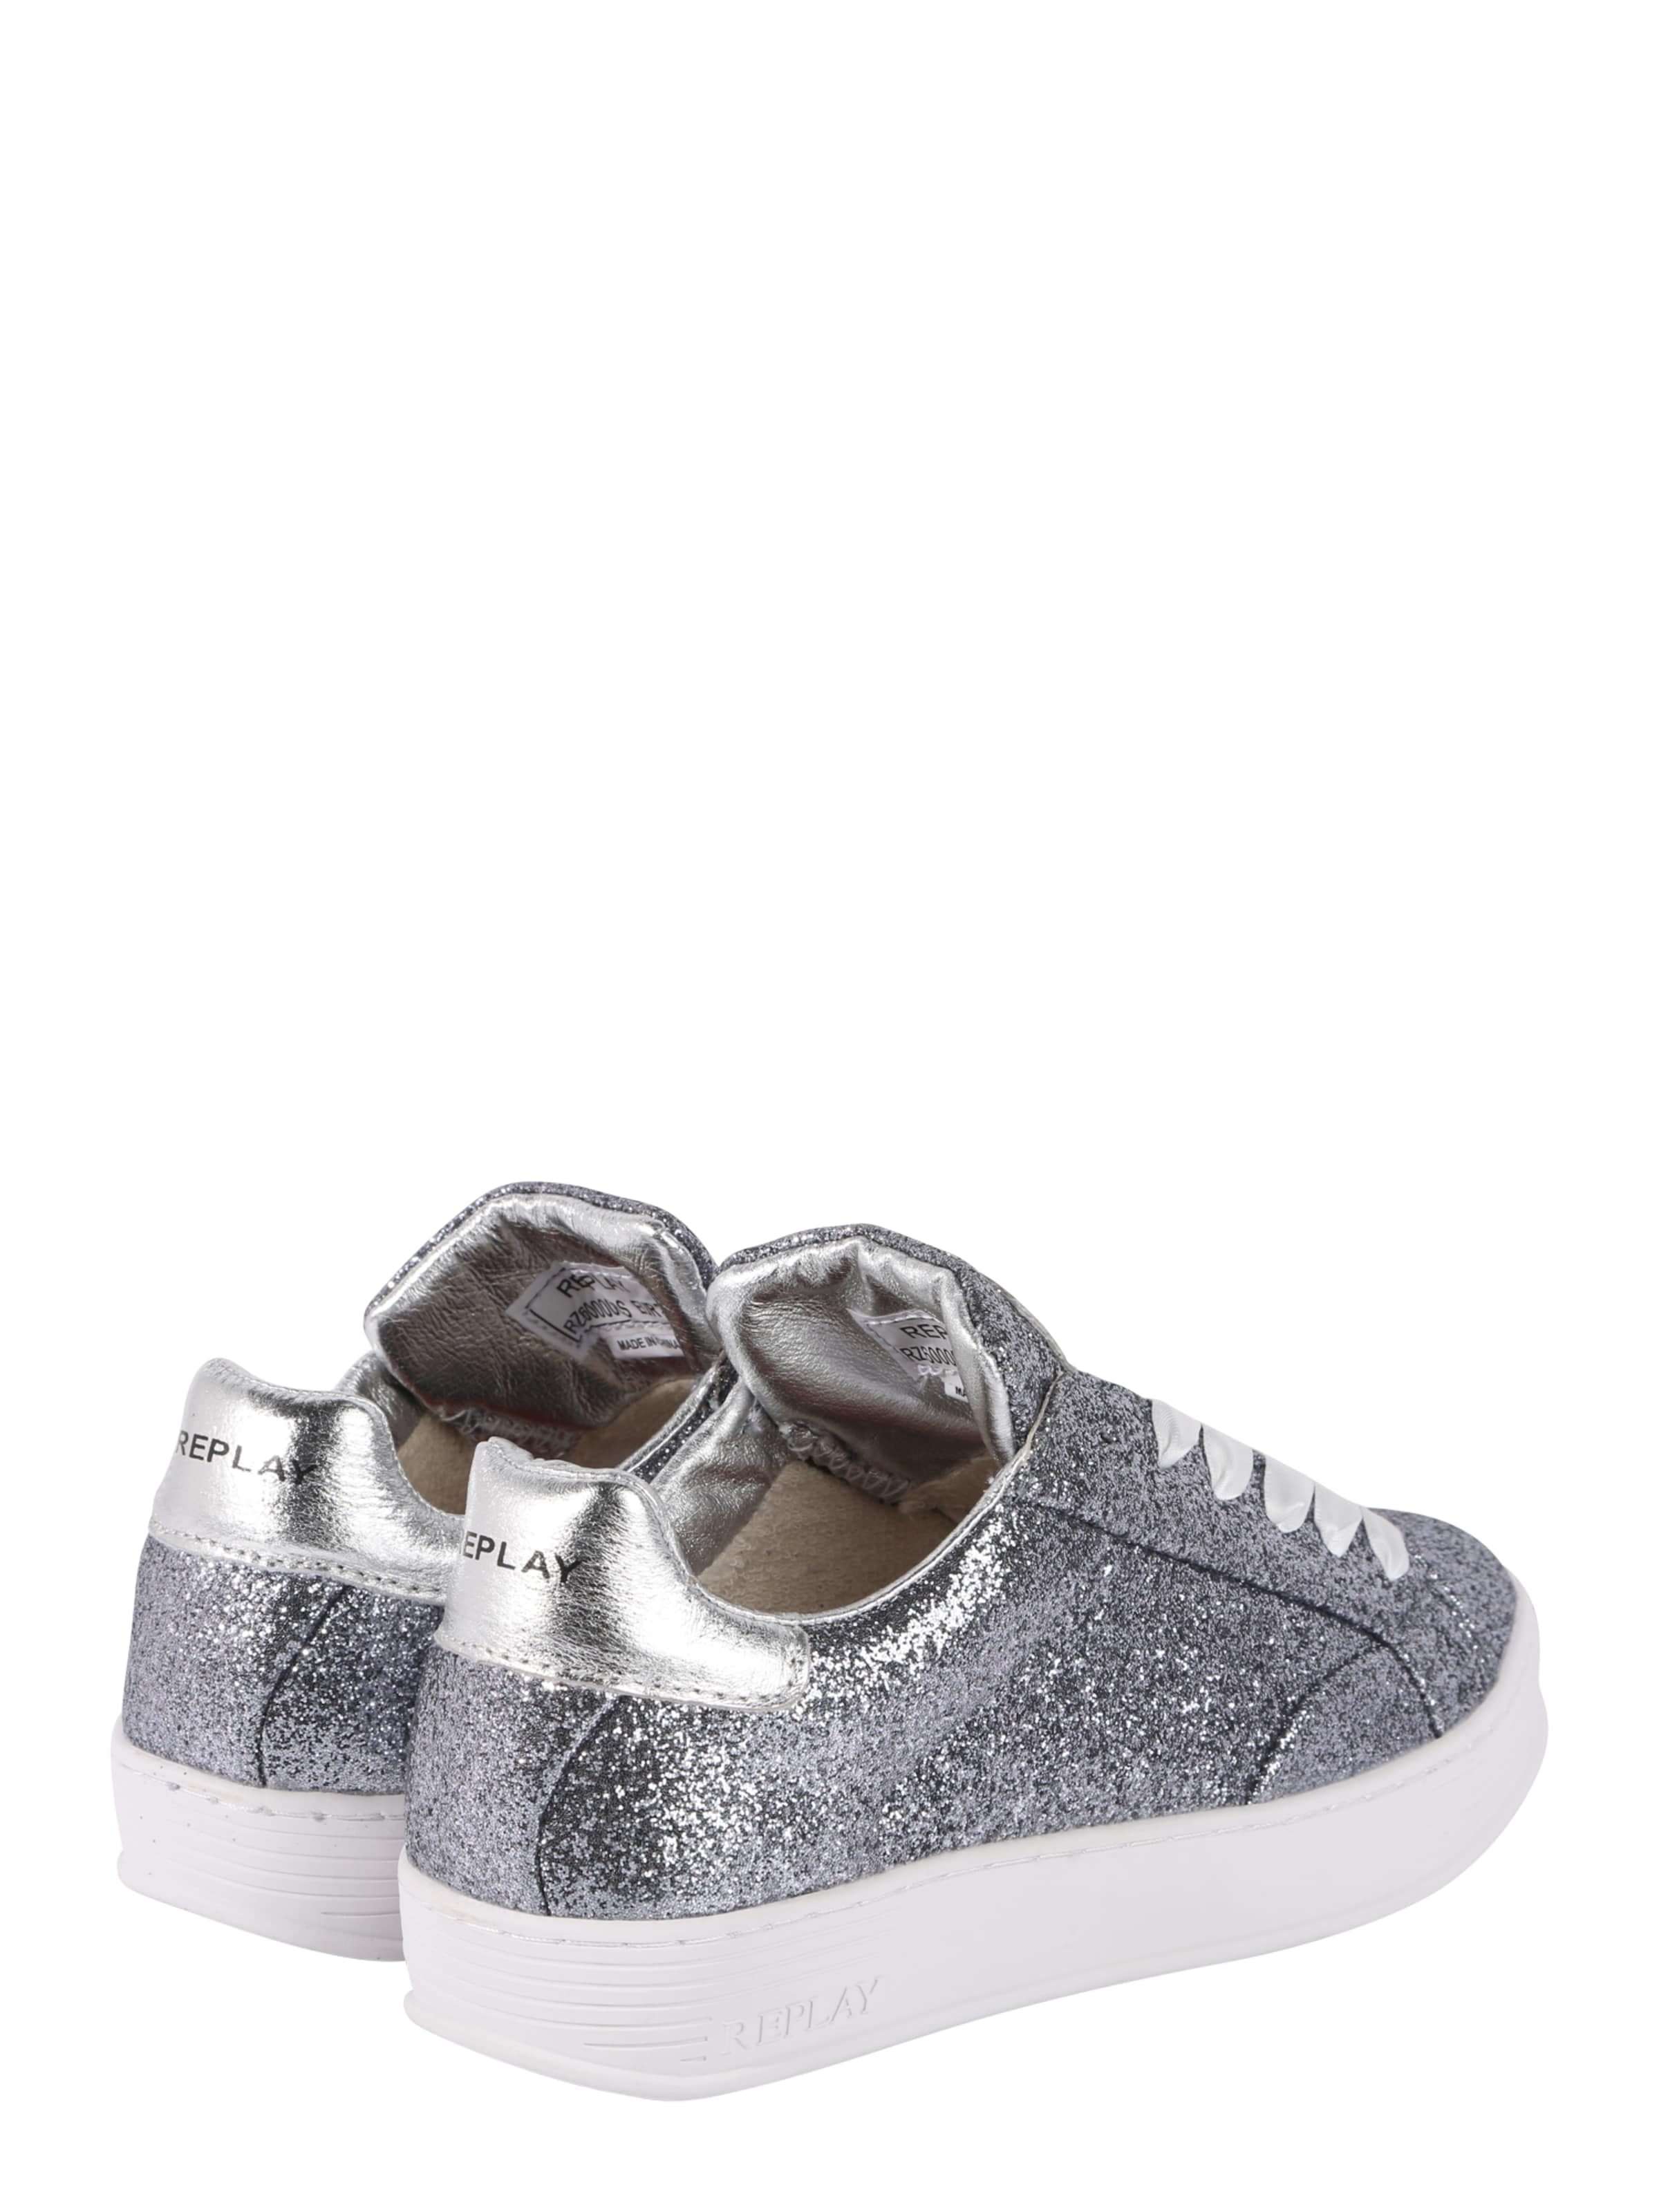 'WELH' REPLAY REPLAY Sneaker Sneaker qT7FtnOv